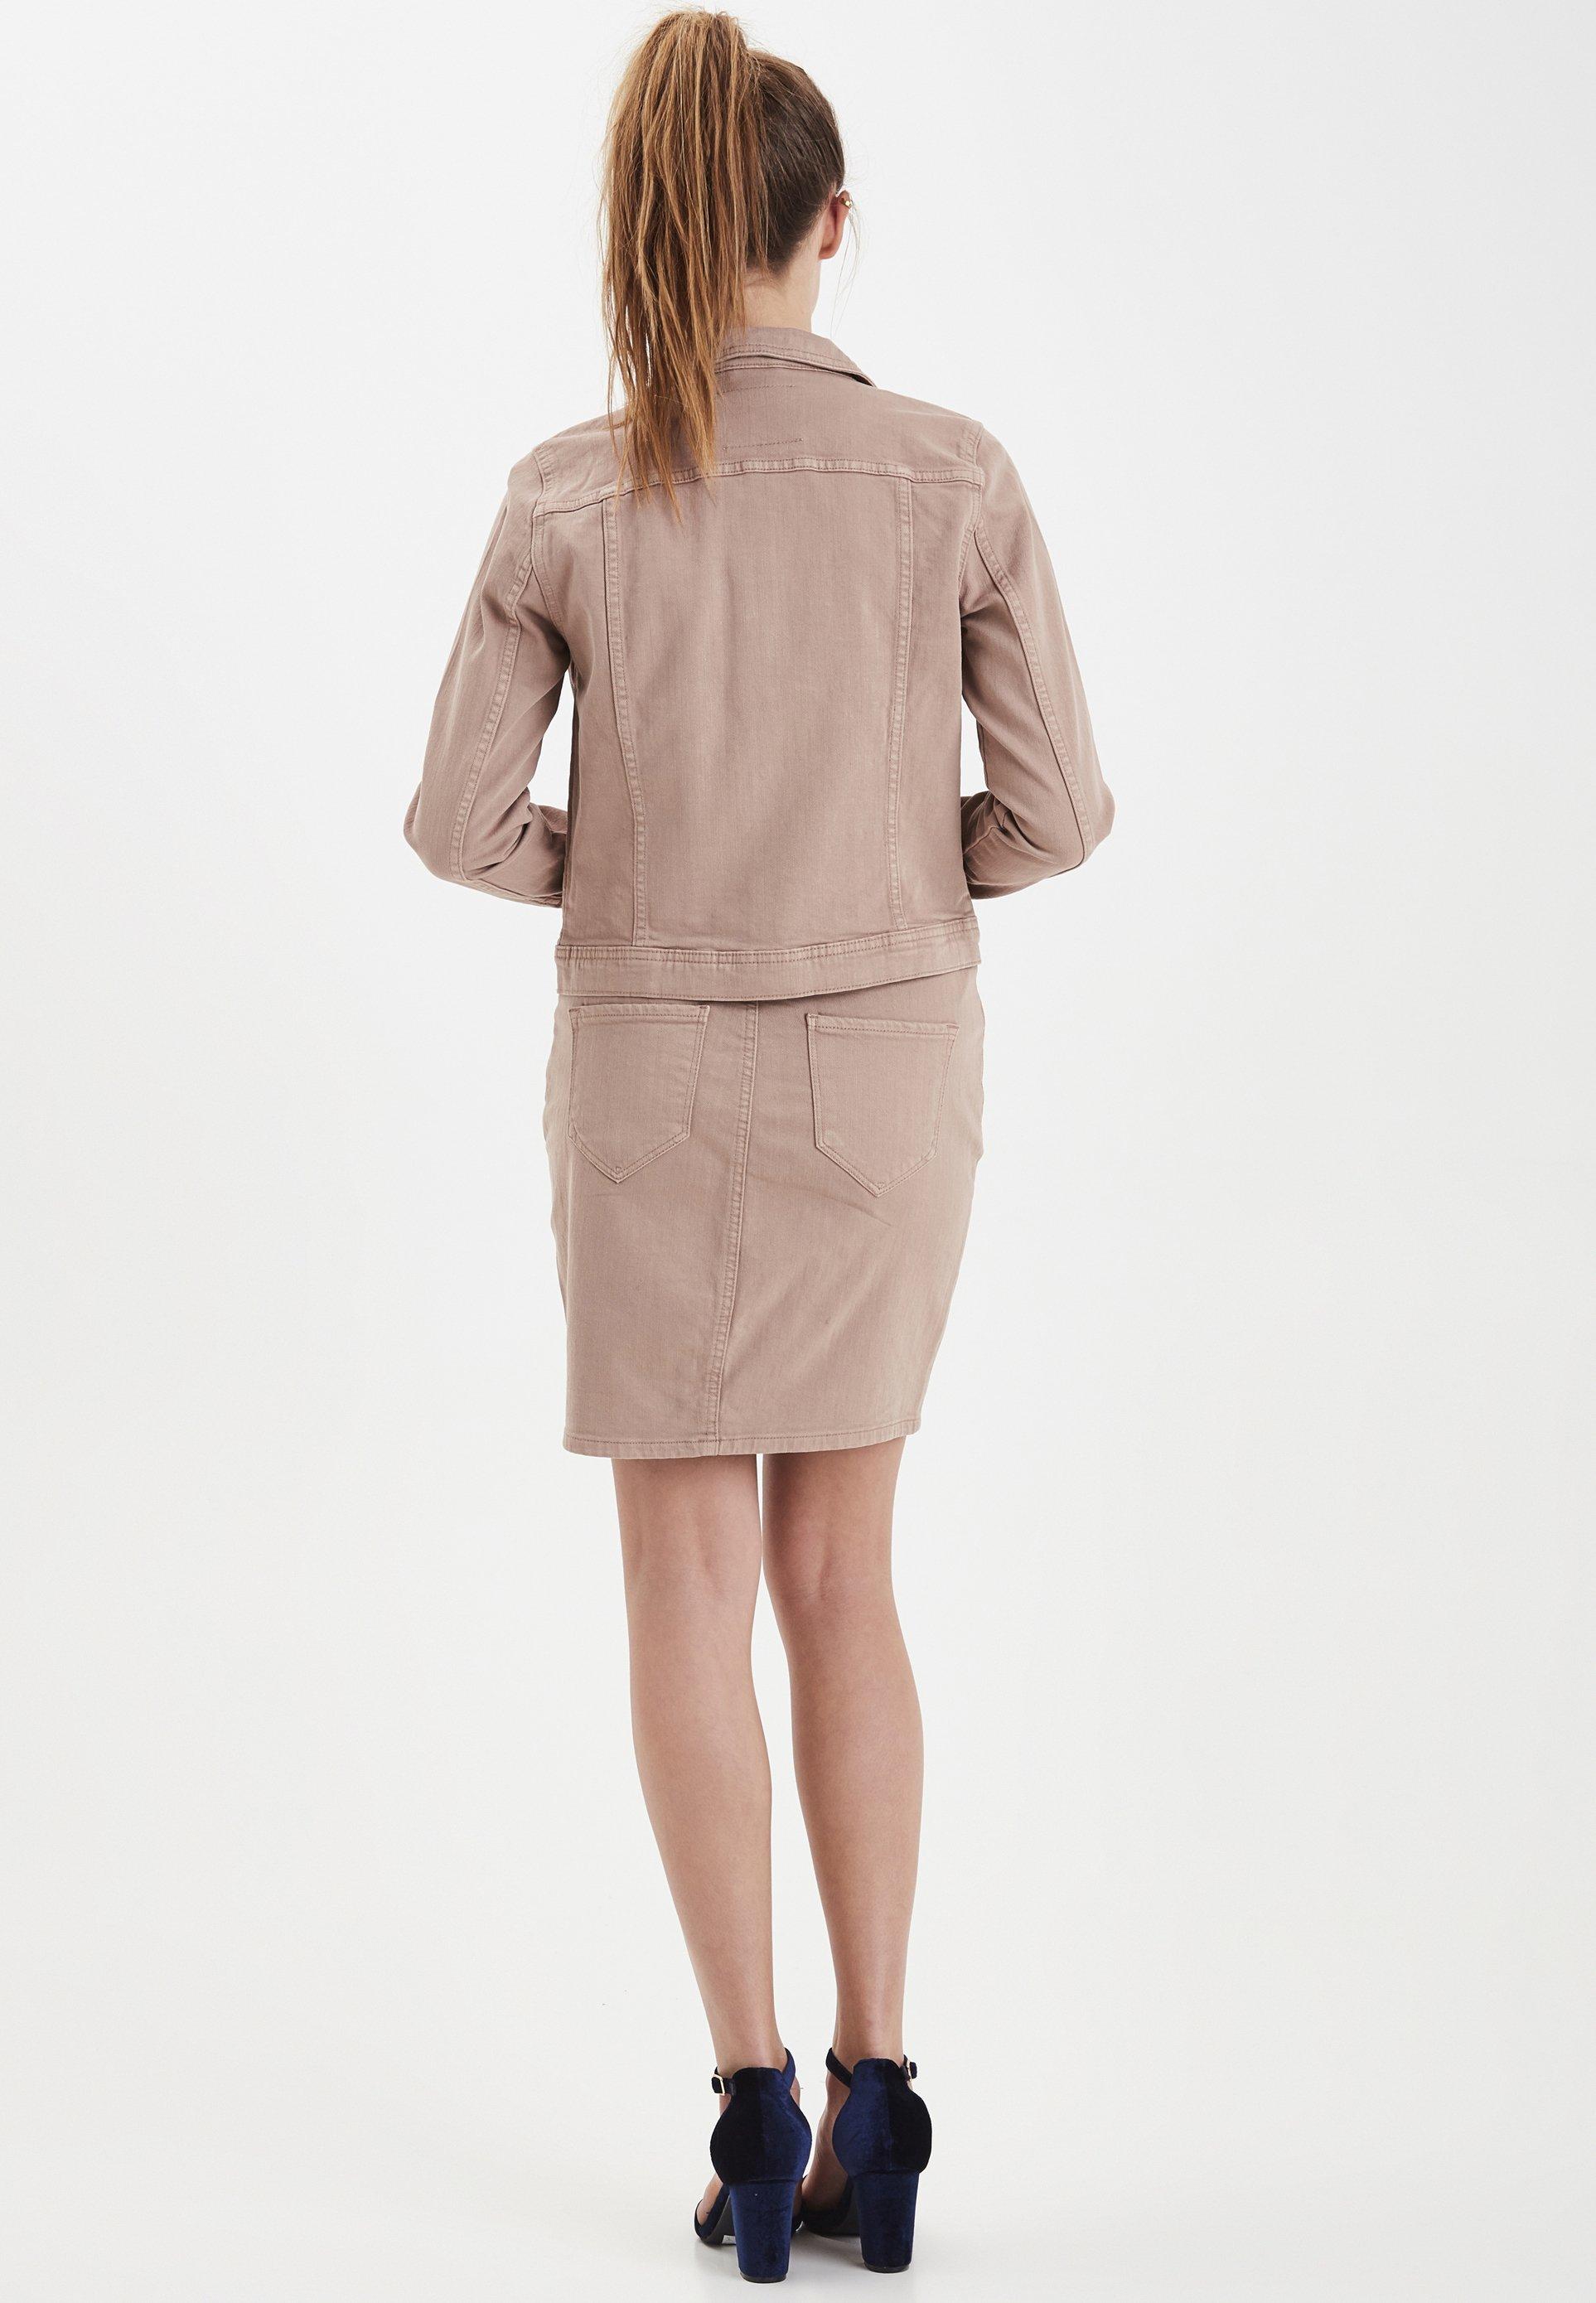 ICHI IHGUSTO - Veste en jean - sand - Vestes Femme aLIG7